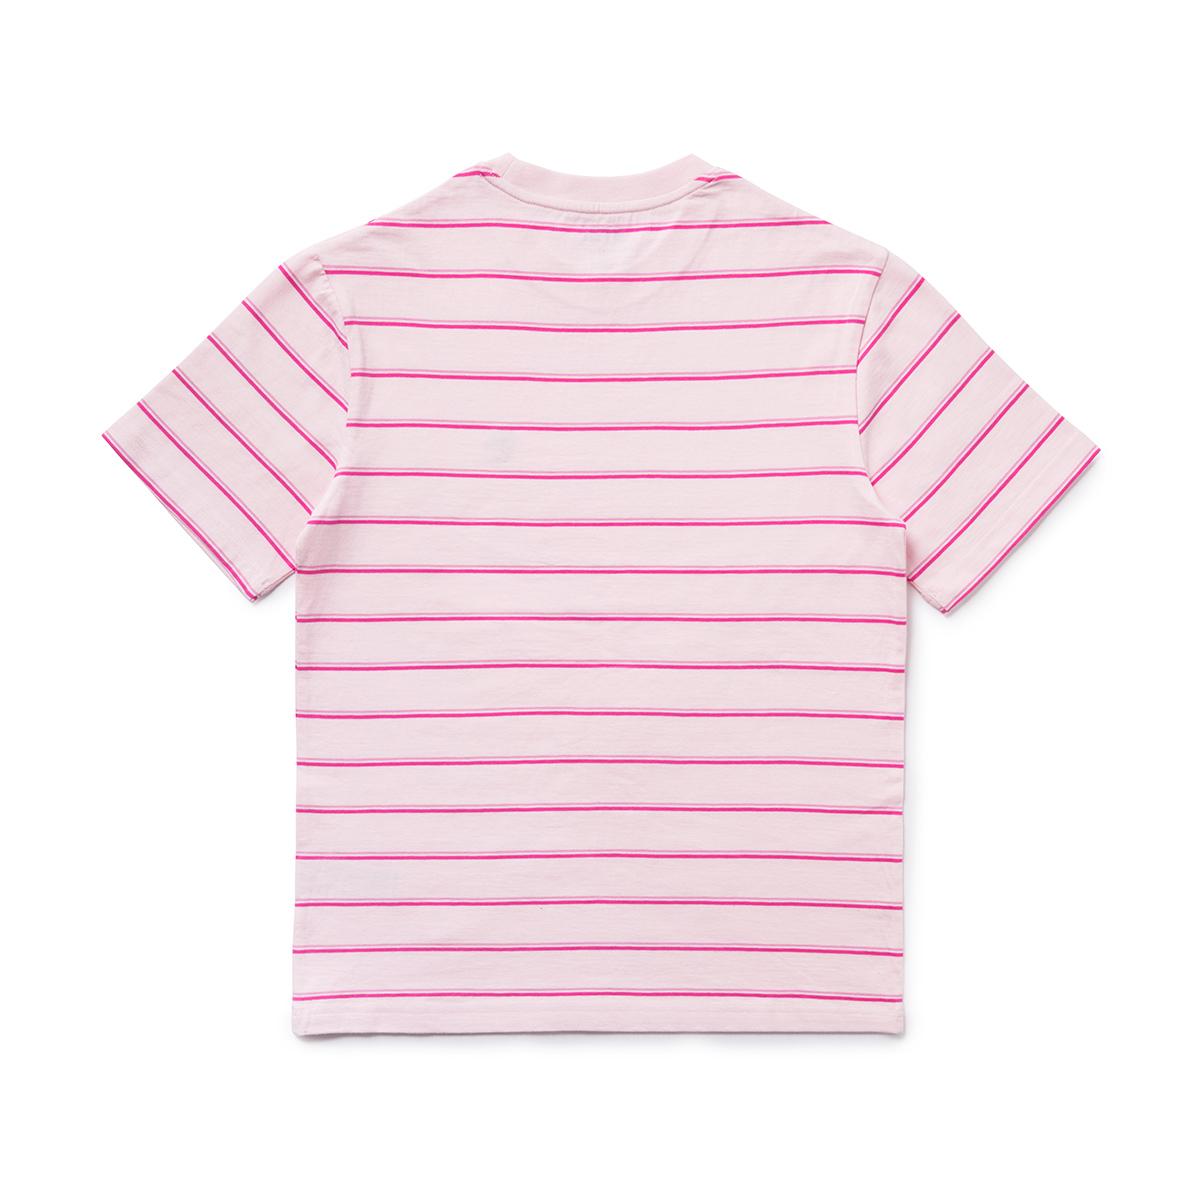 bt21_basic_stripe_tshirt_03.jpg